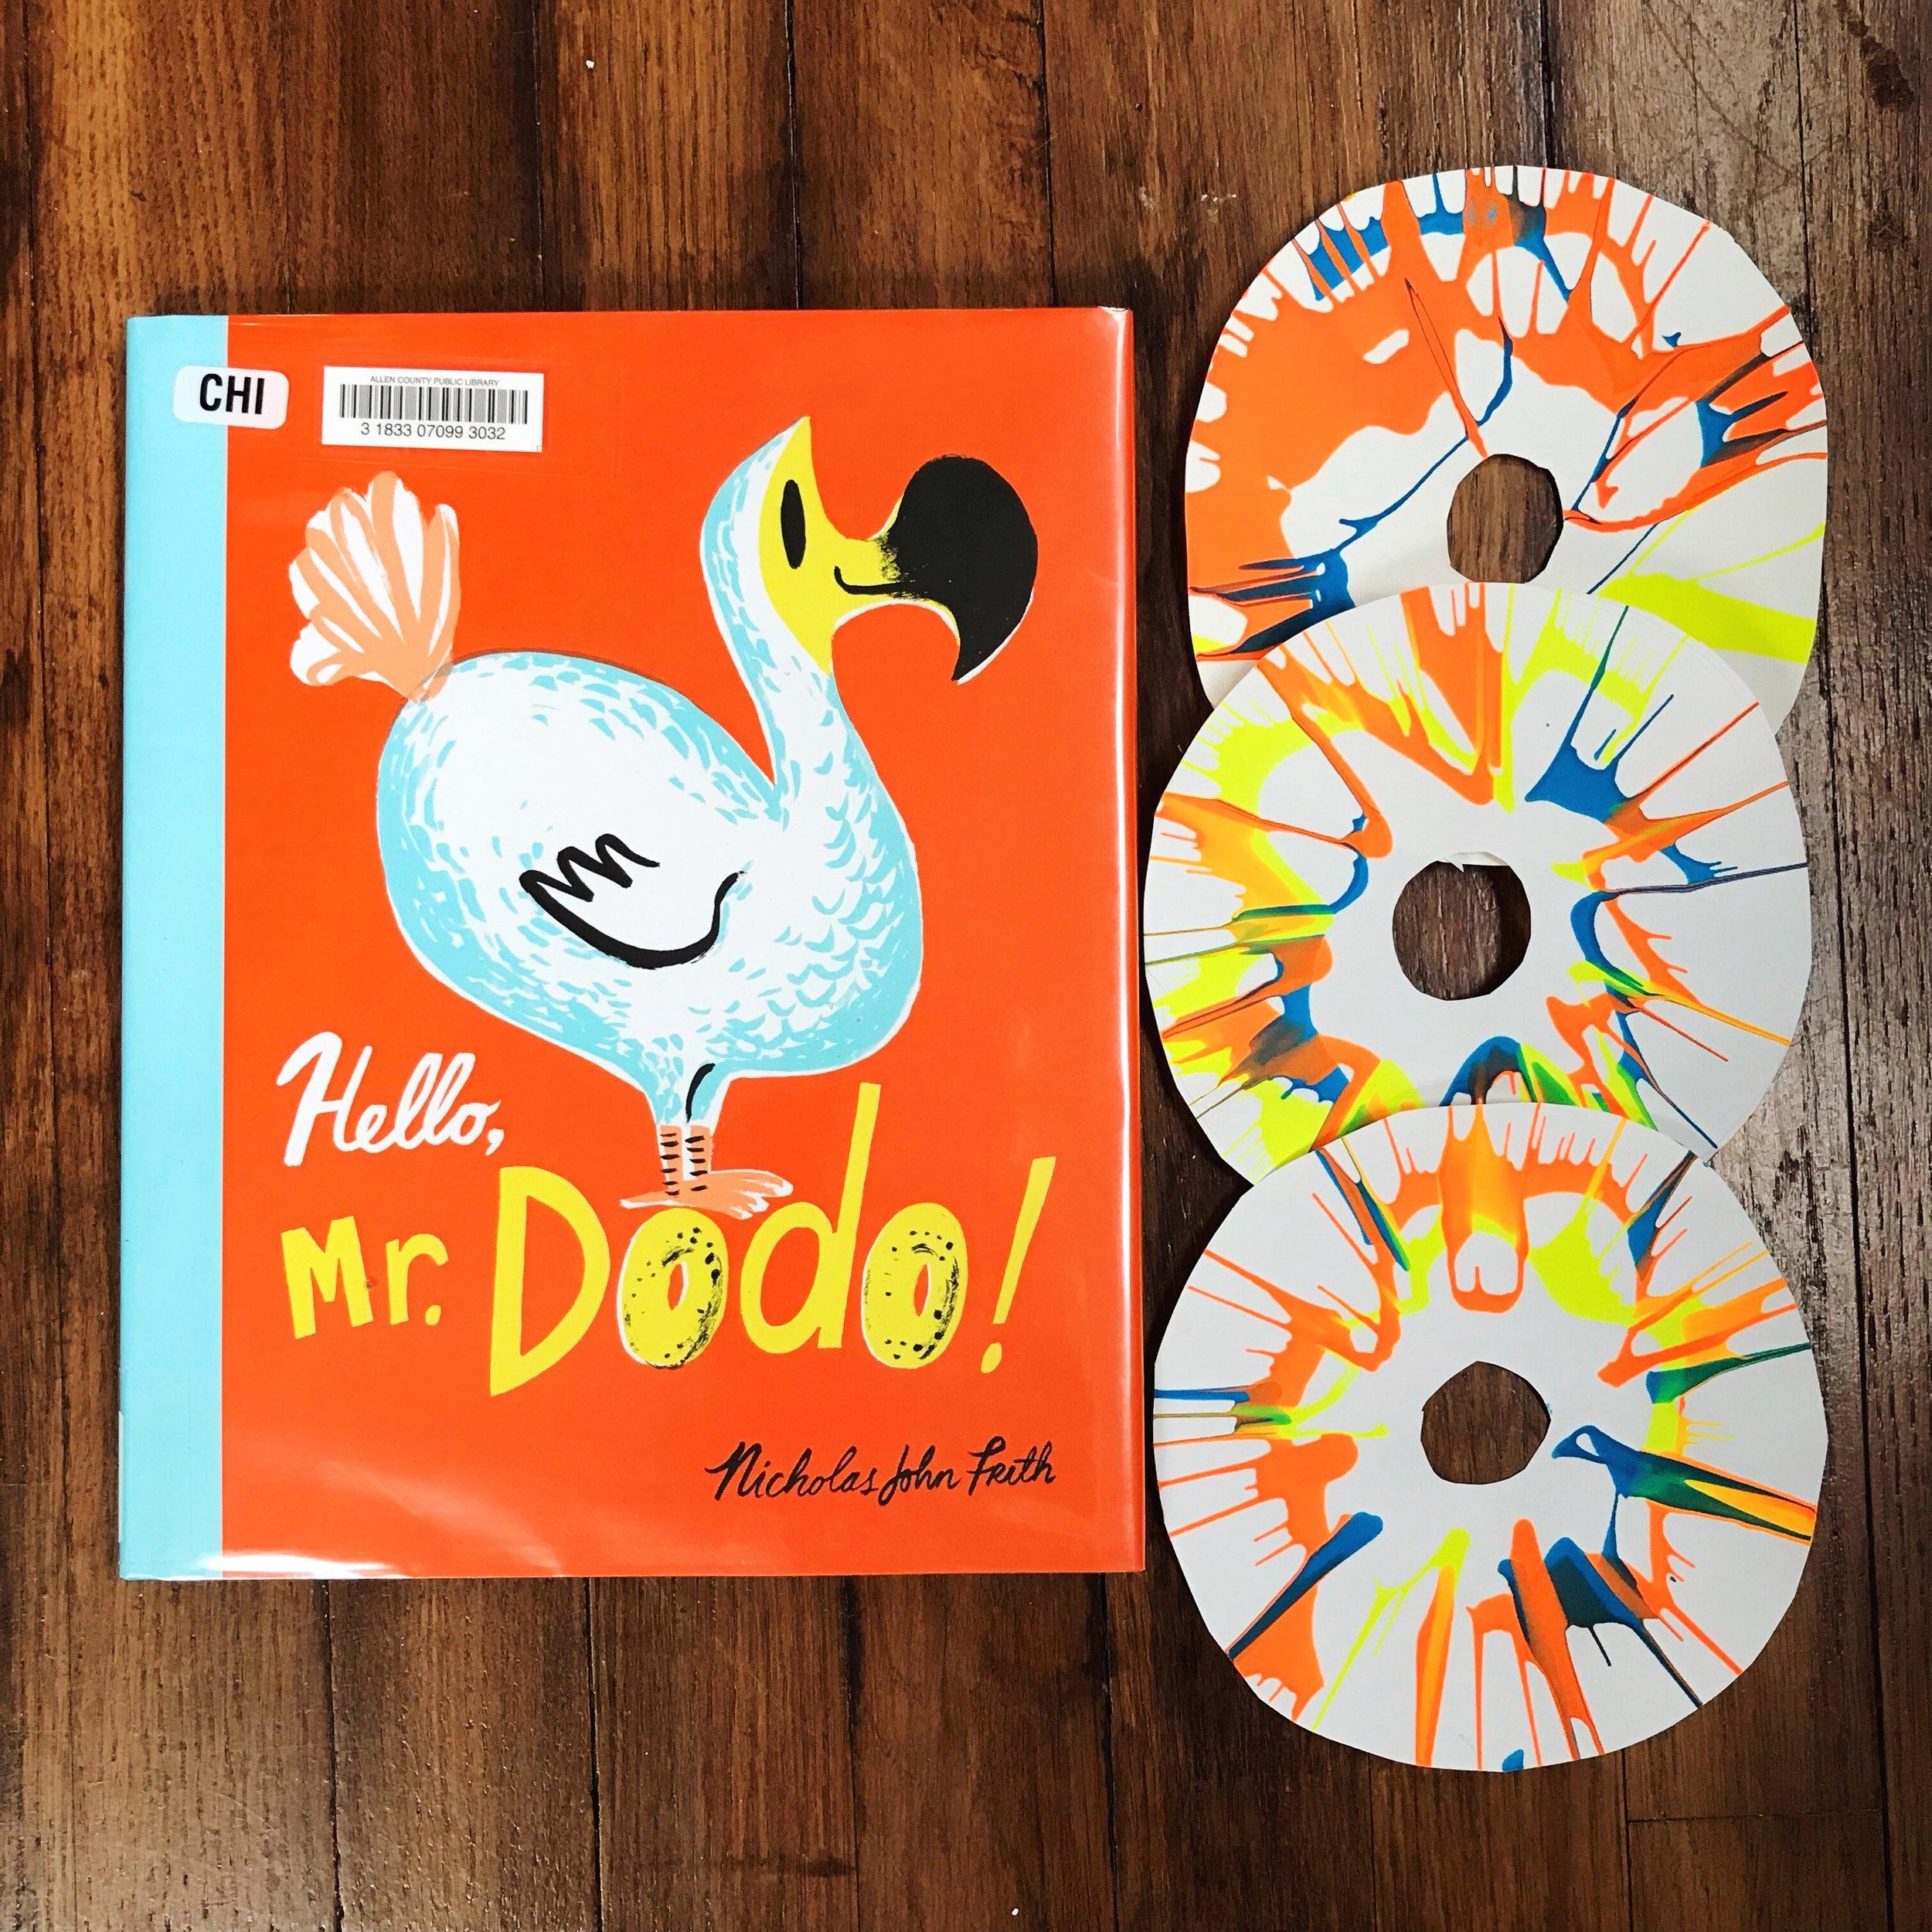 Hello, Mr. Dodo!  by Nicholas John Frith